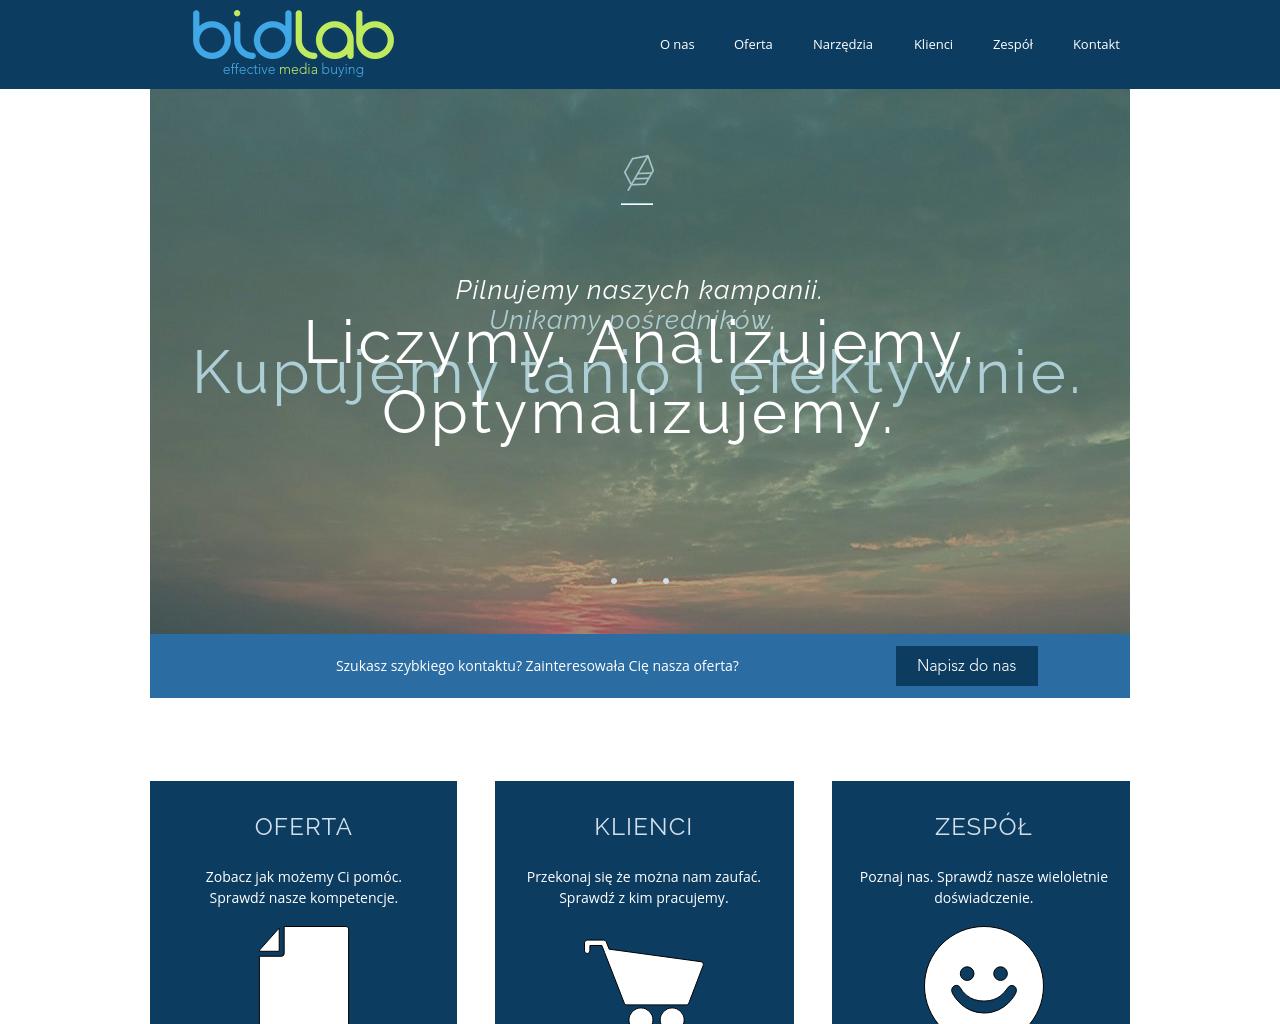 Bidlab-Advertising-Reviews-Pricing